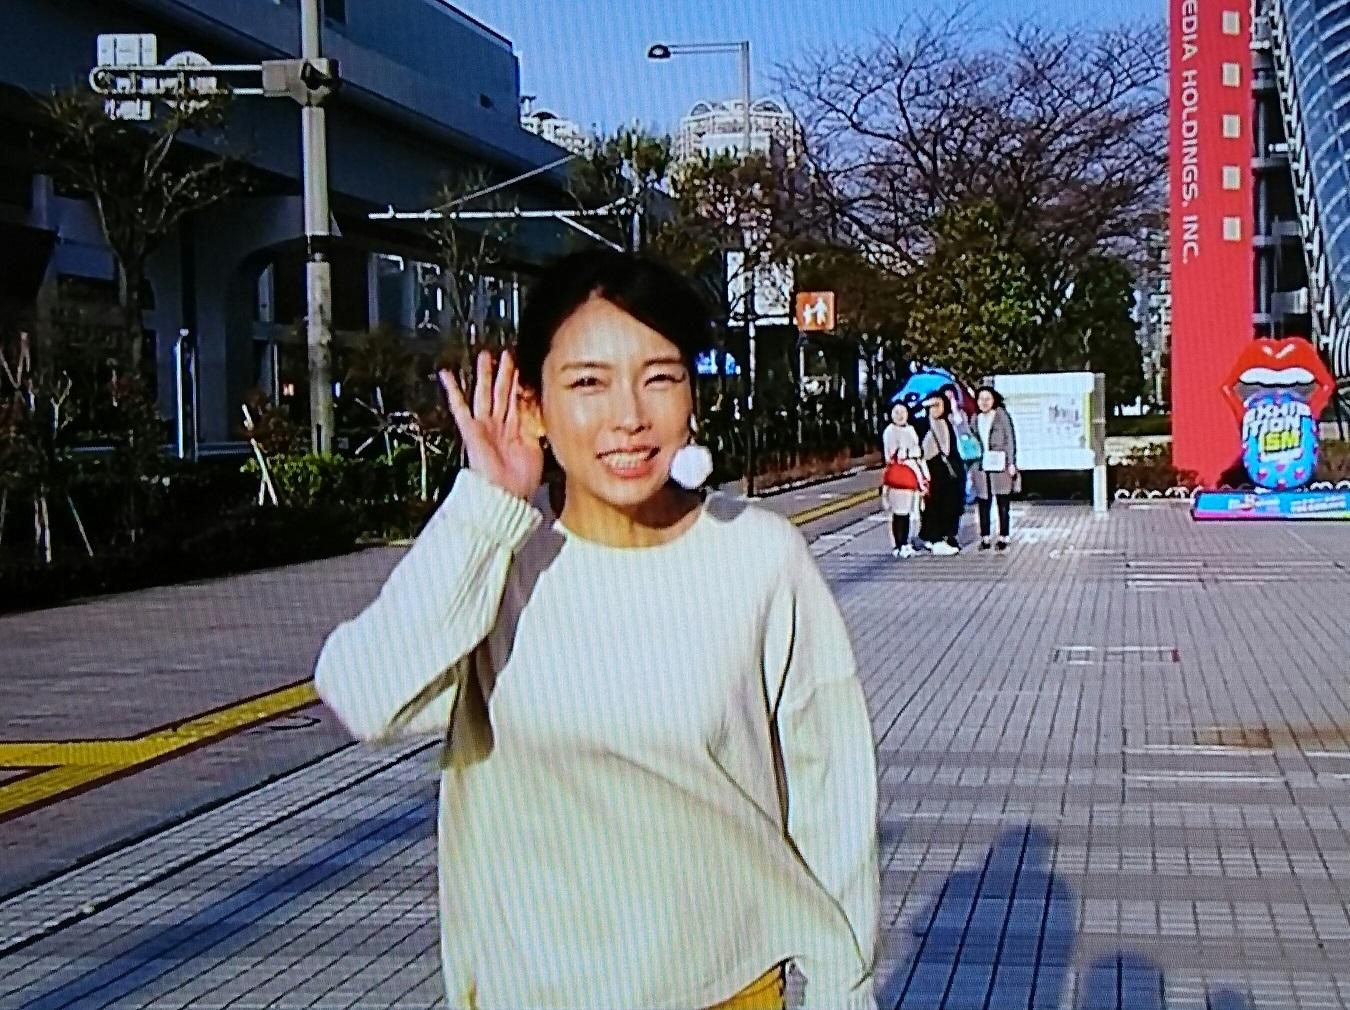 2019.2.7 寺川奈津美さん (4) 1350-1010